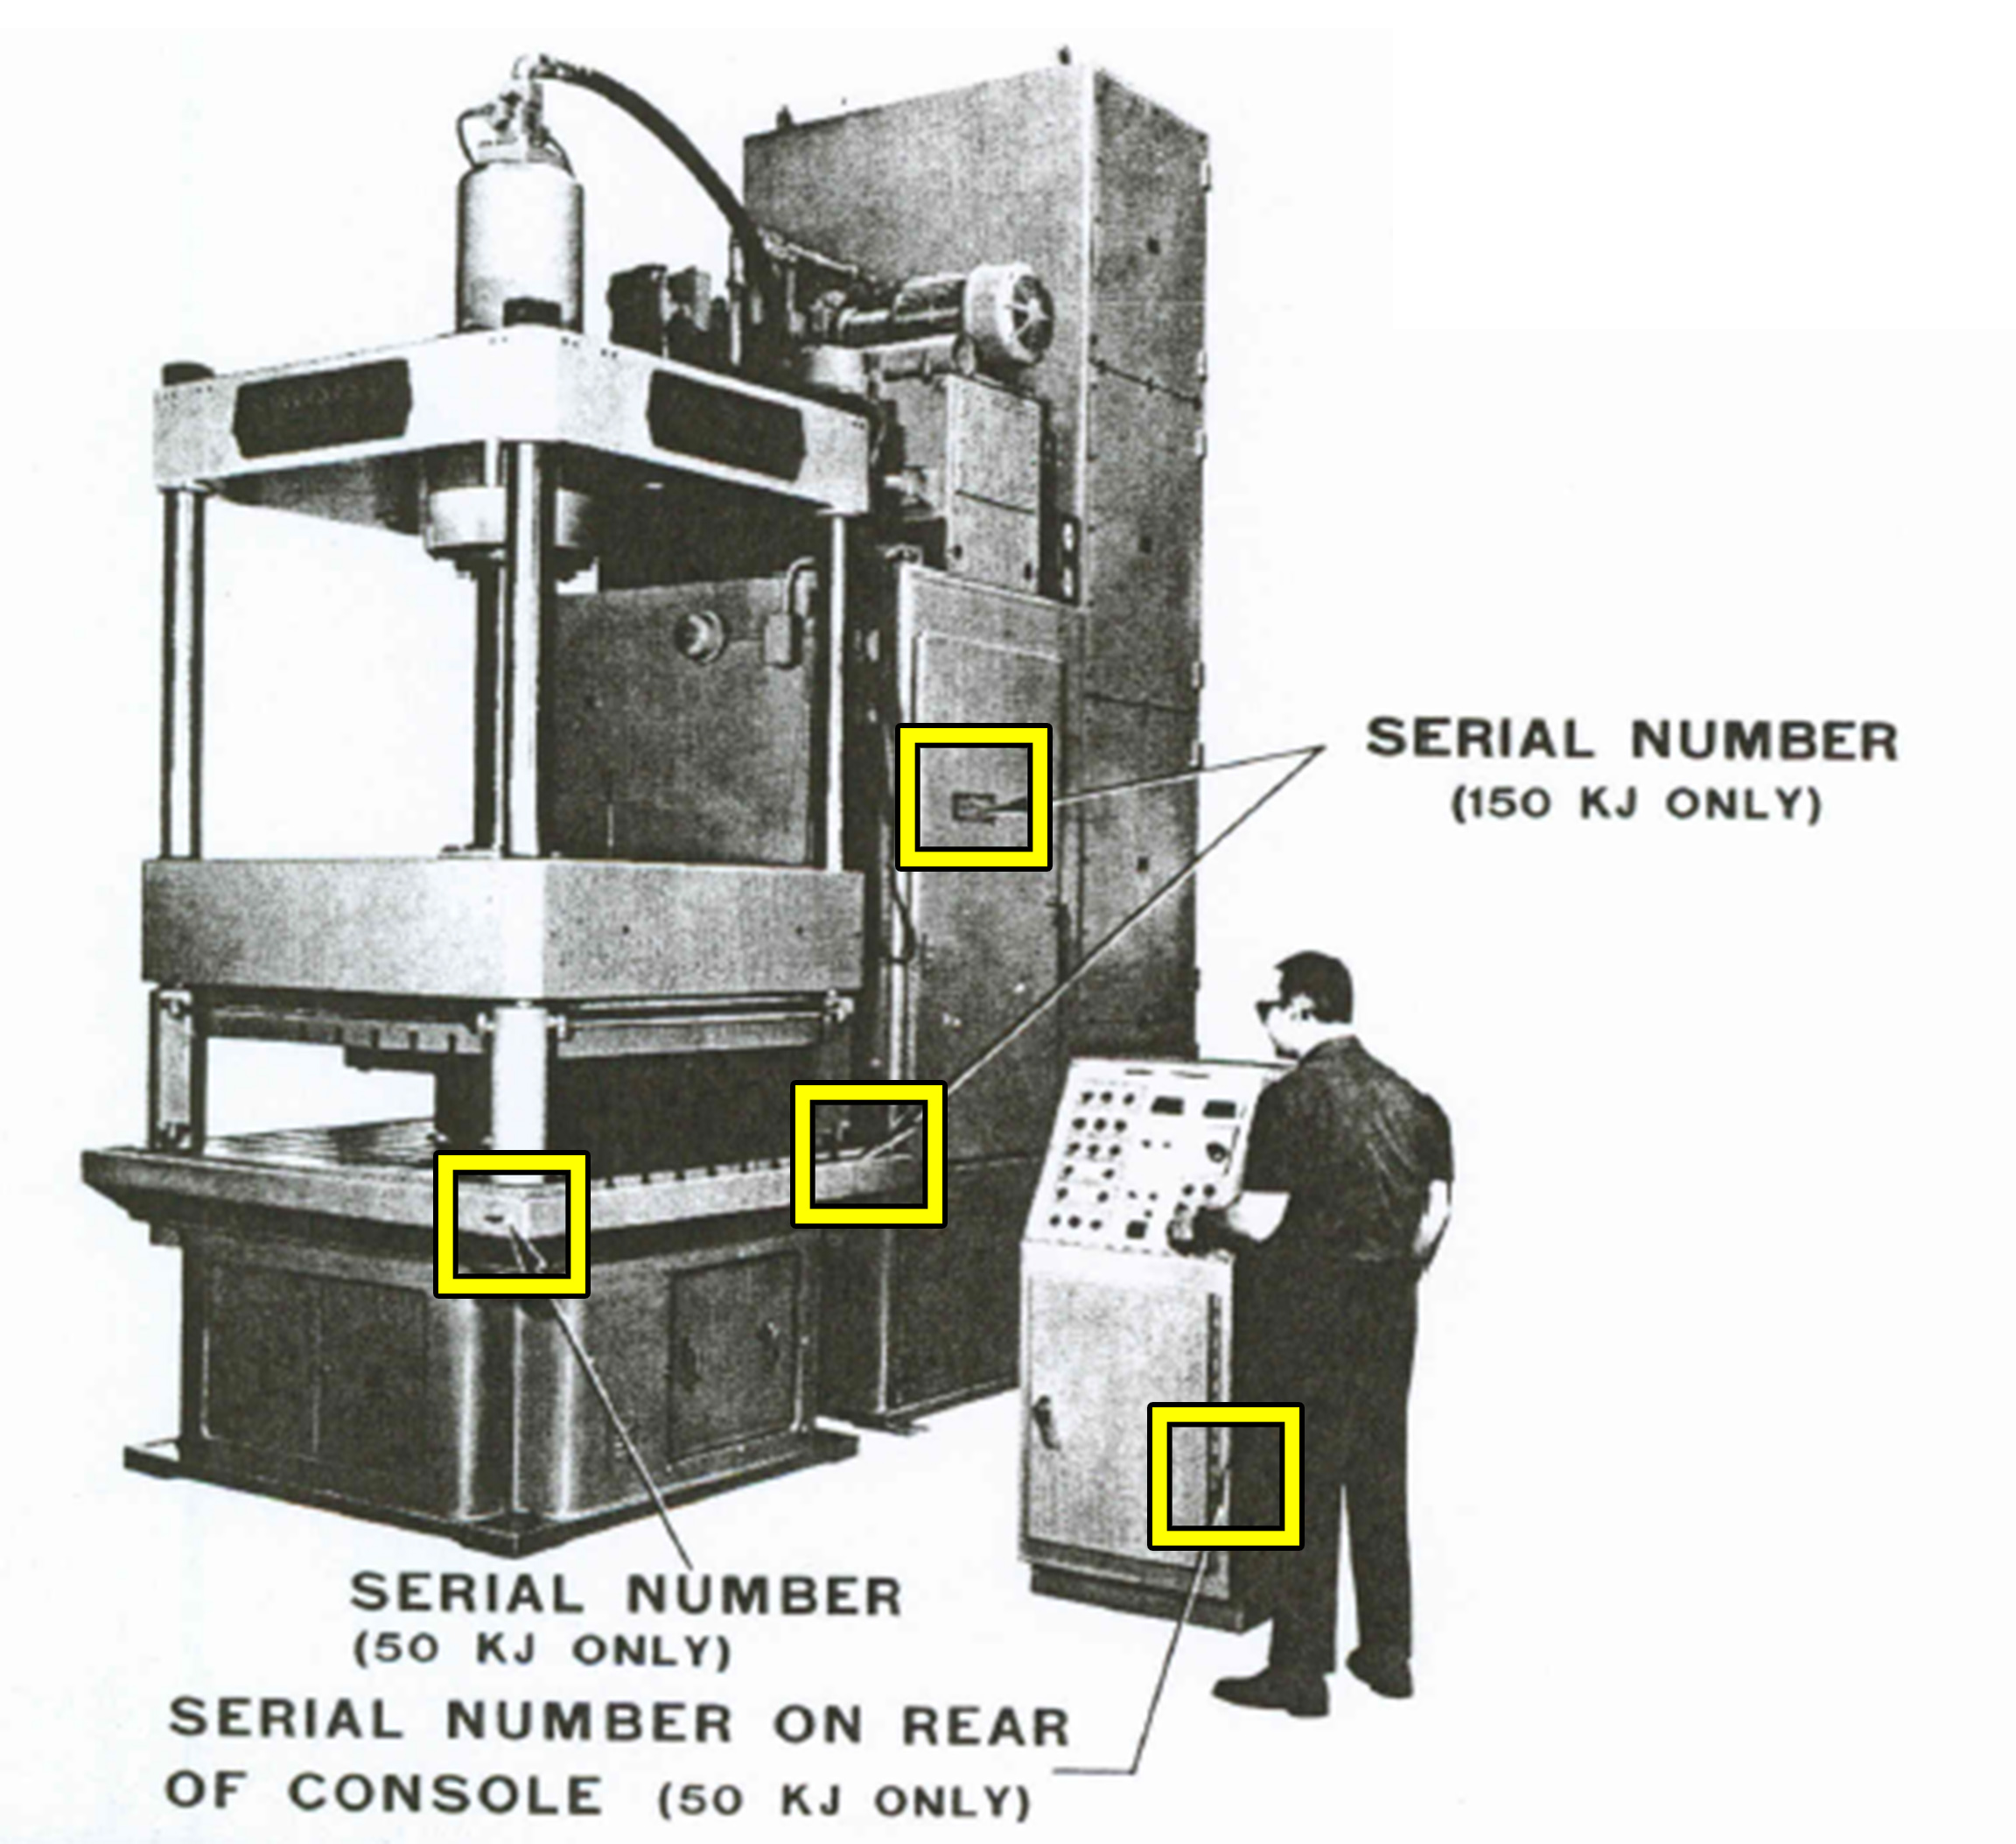 Electroshape Serial Number Location